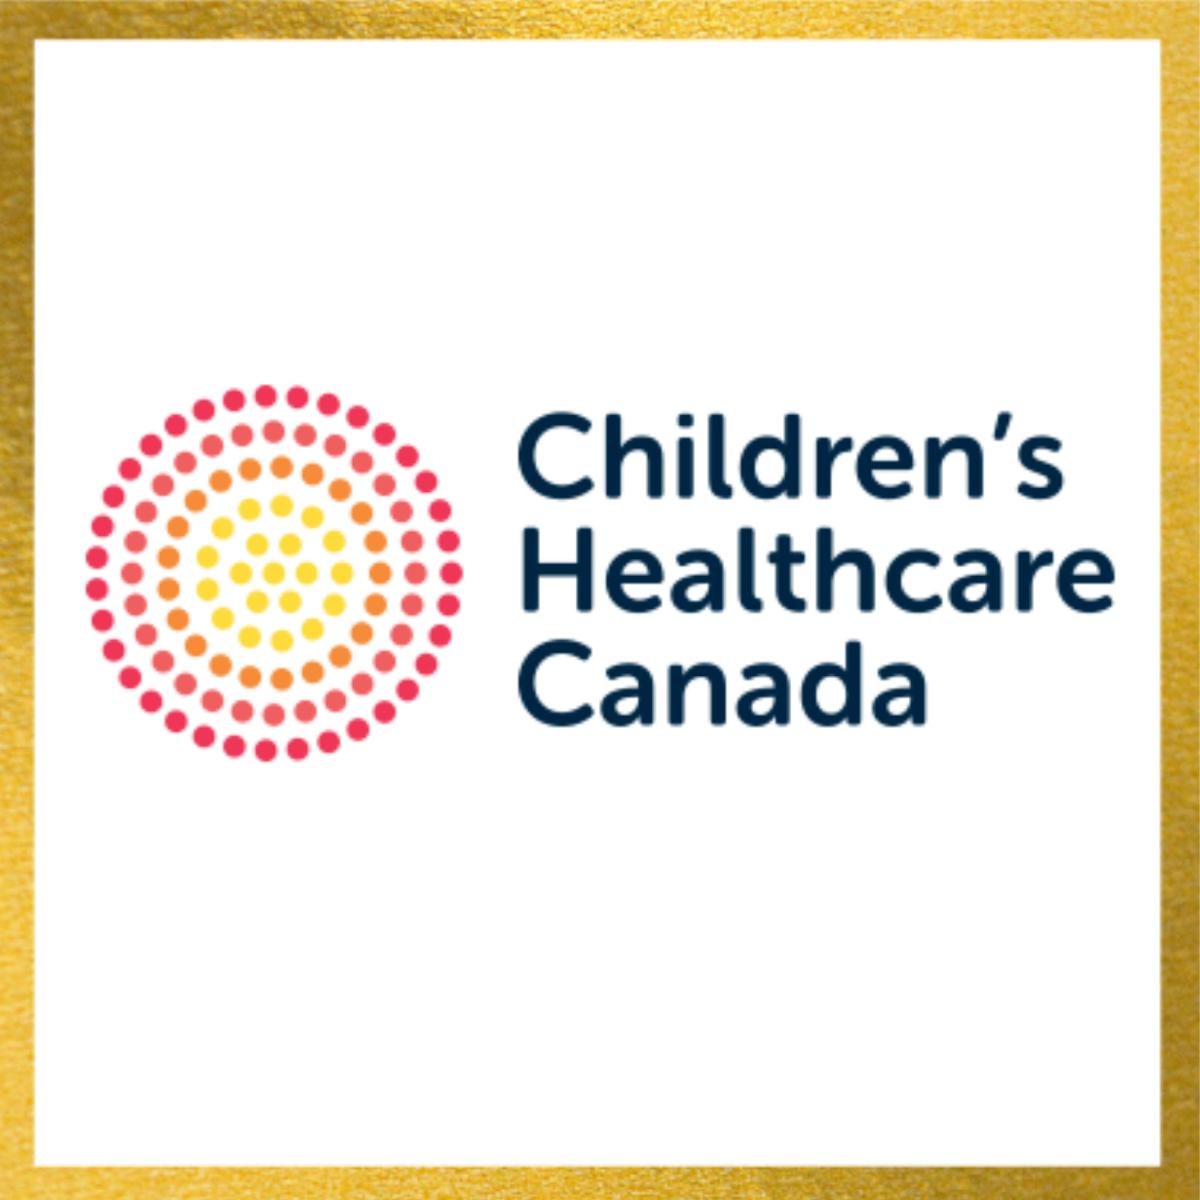 Children's Healthcare Canada